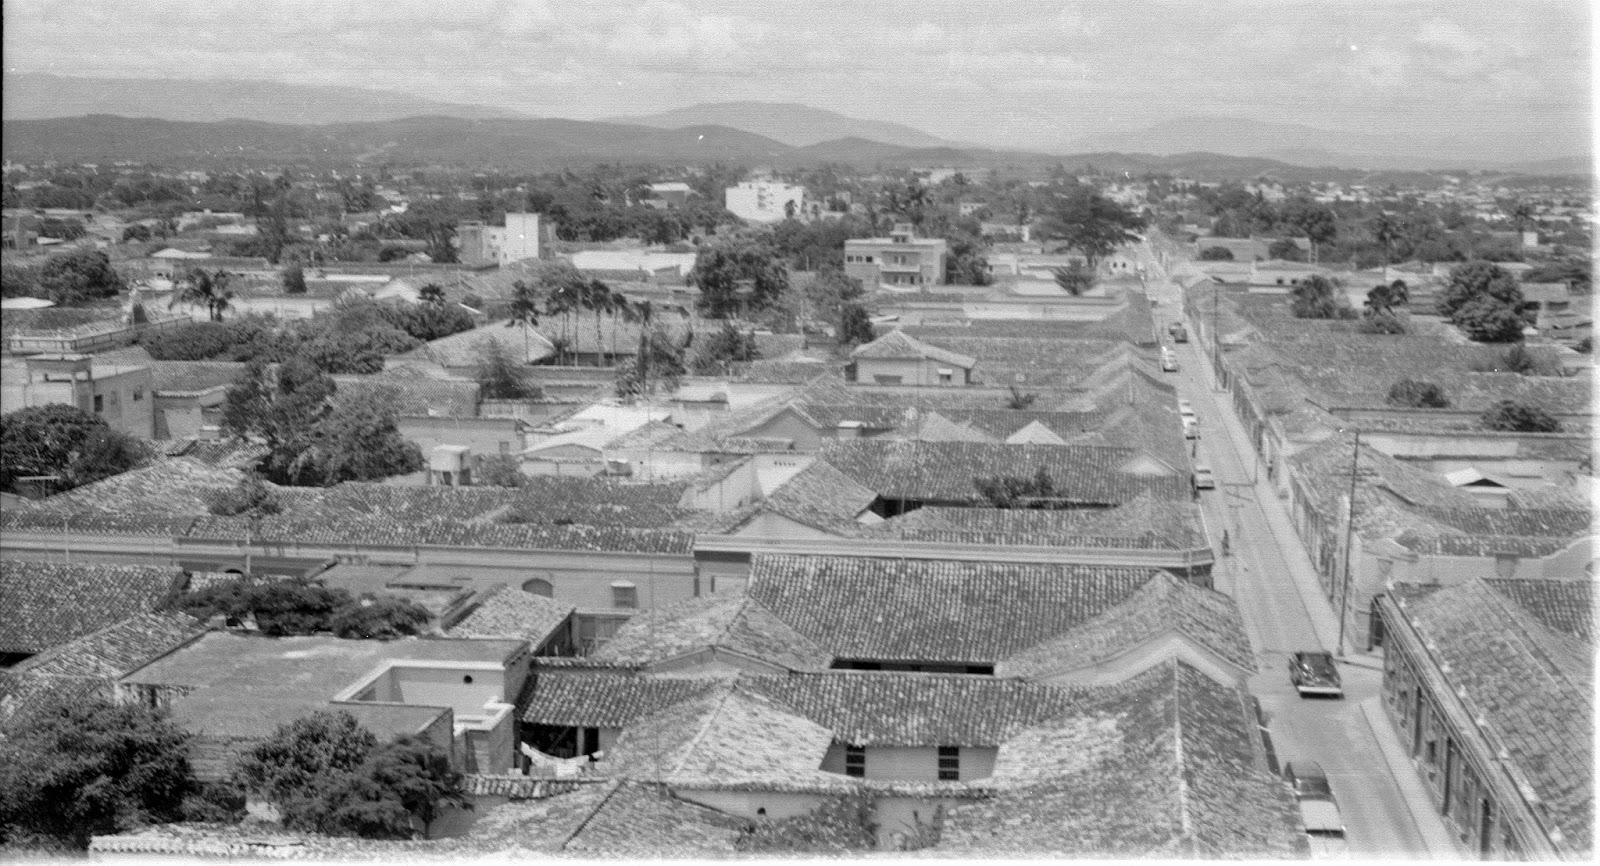 Barquisimeto luego del Terremoto de 1812